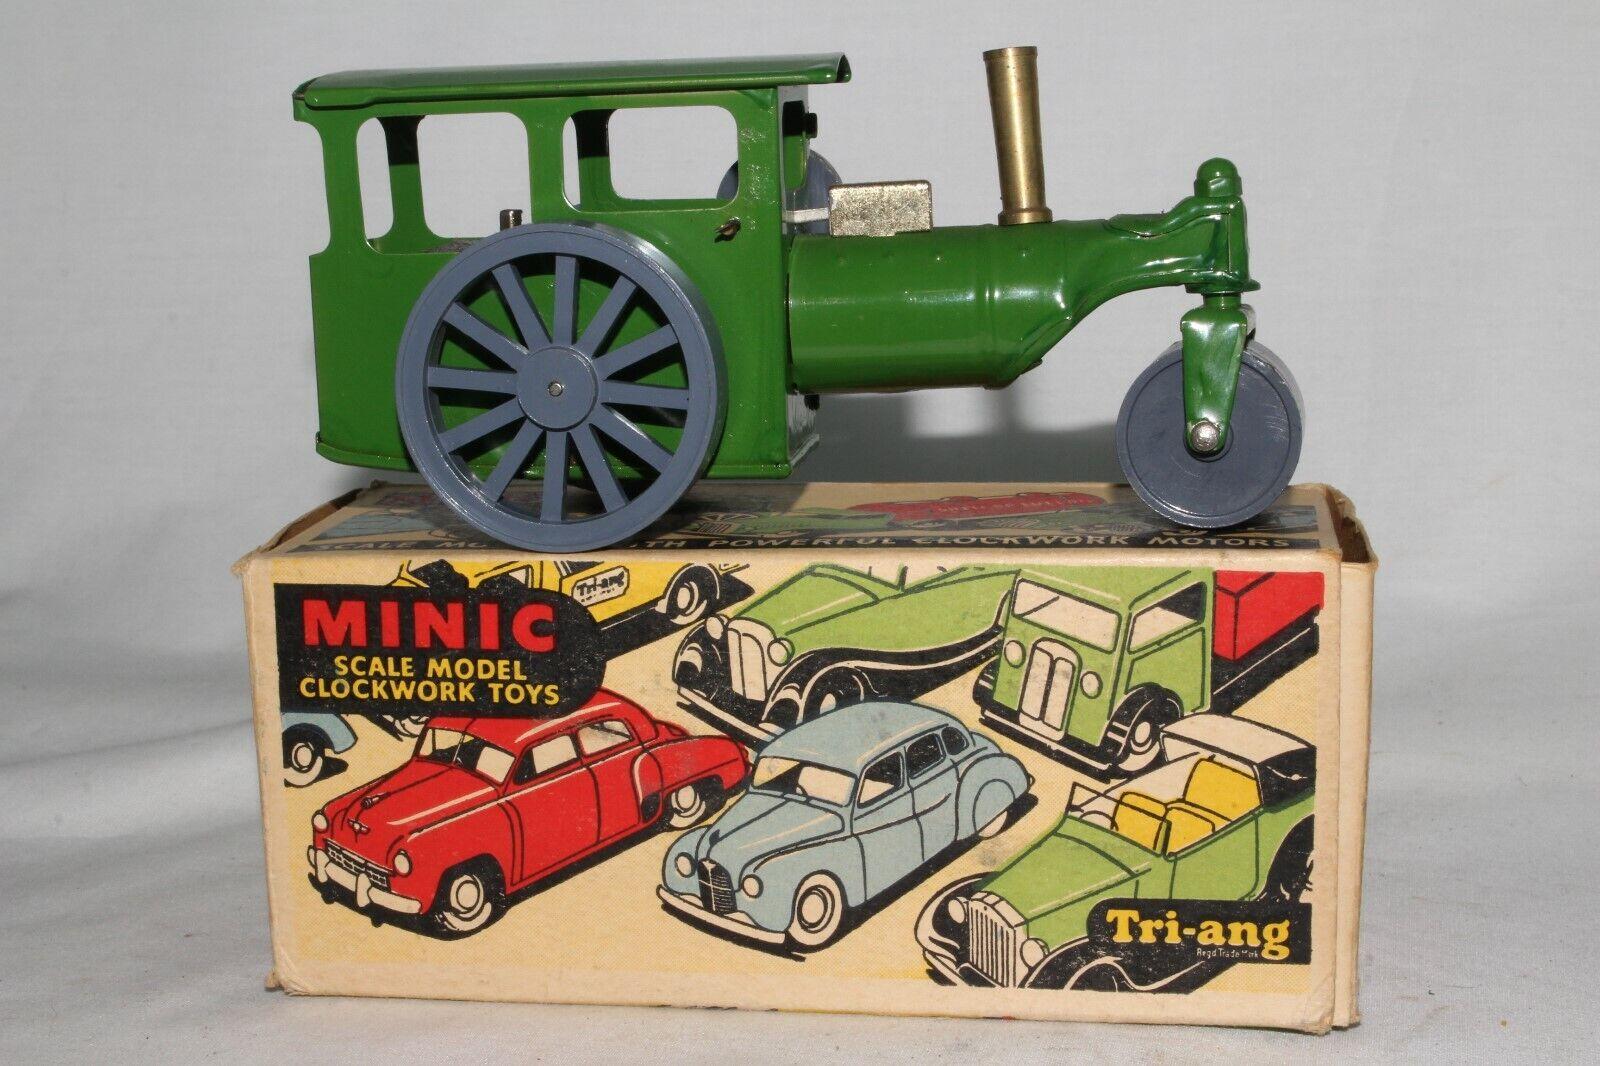 Triang Minic 594ms Dampf Roller Traktor mit Original Kiste, Schön